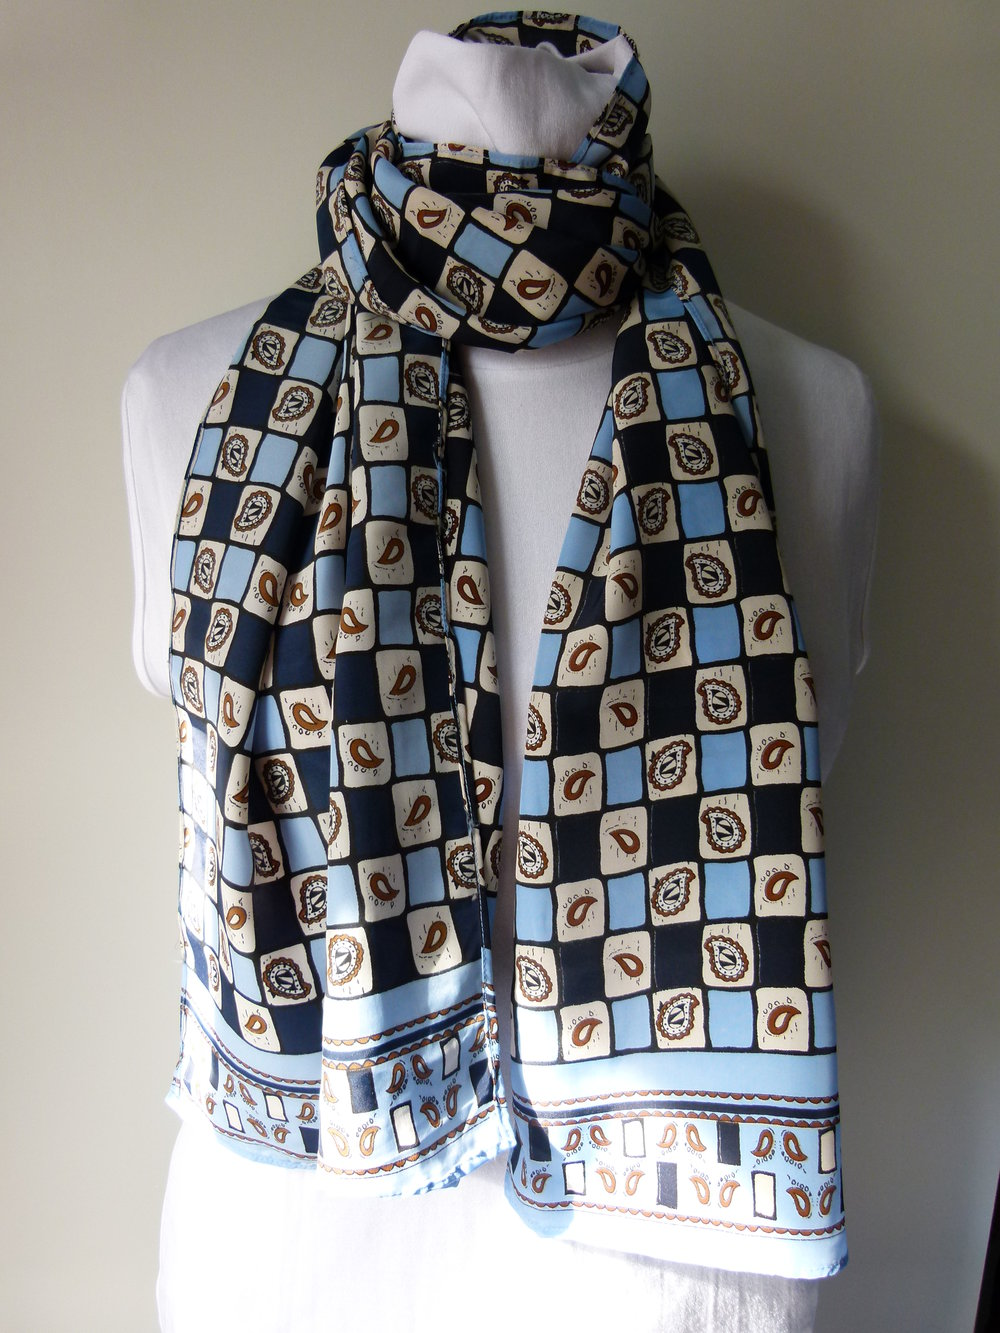 4b4d07191c5b8a Sommer Schal Halstuch, dunkelblau hellblau creme, Schachbrett Paisley-Muster,  Retro Boho Vintage ...